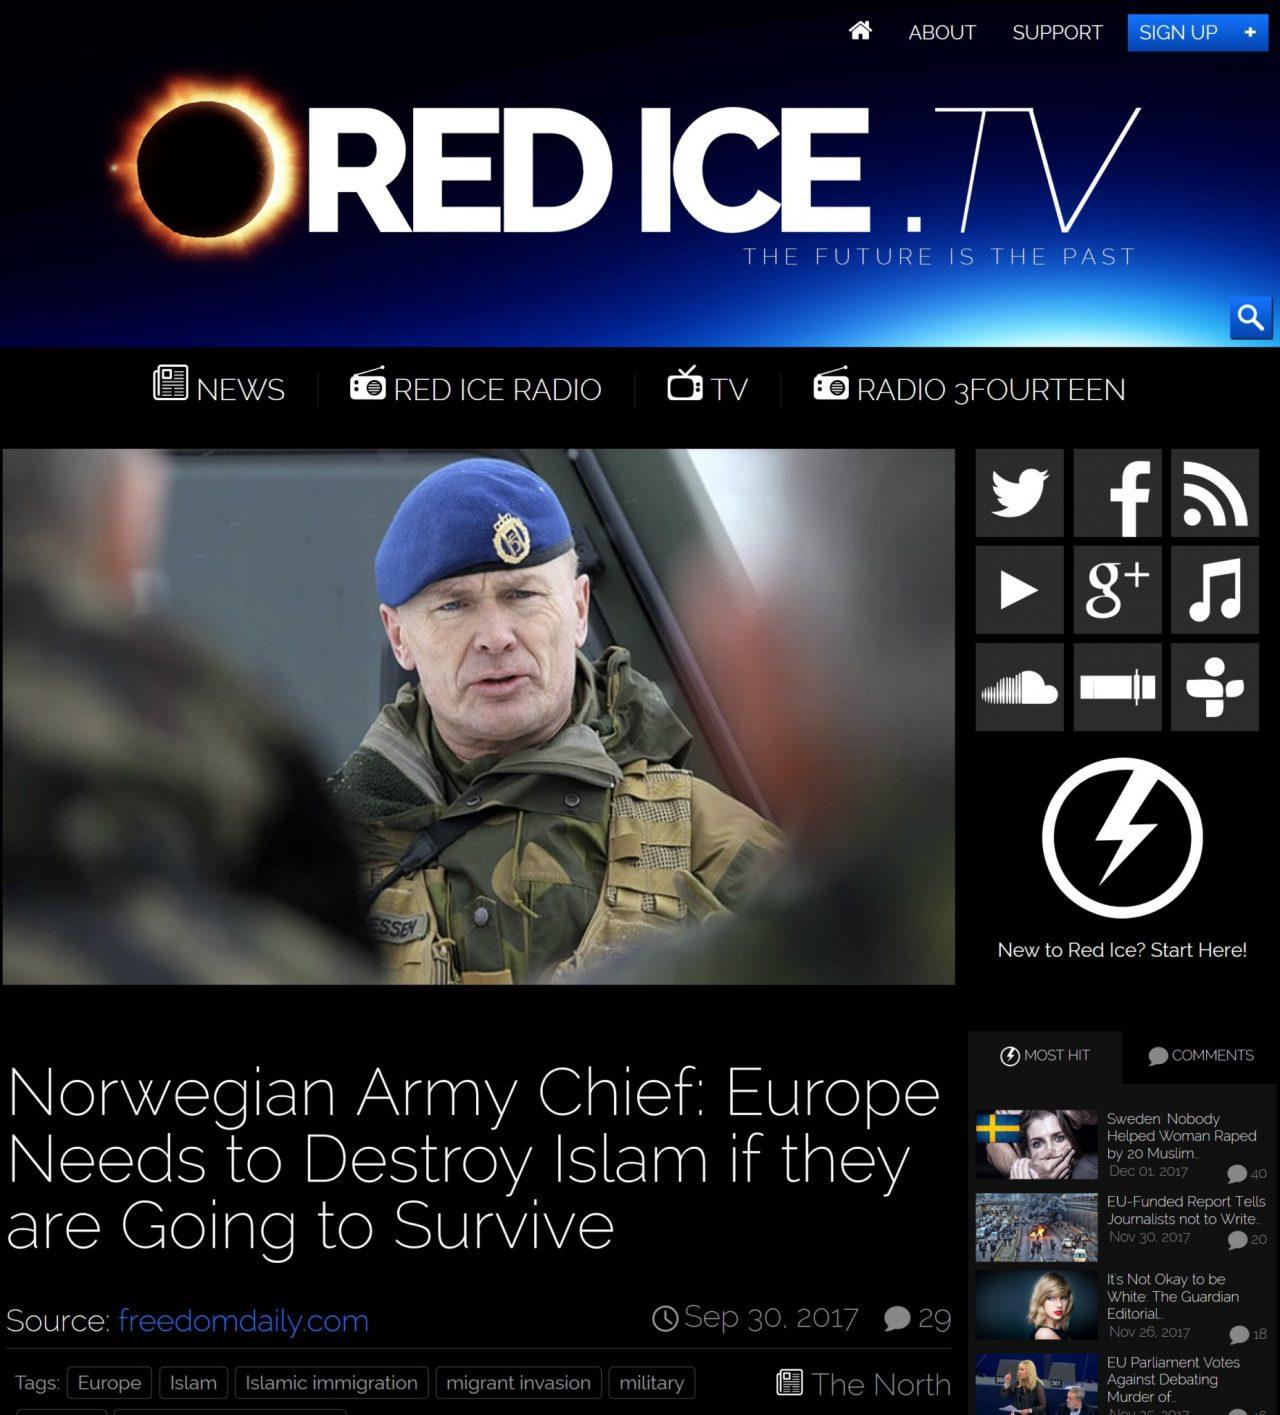 https://www.aldrimer.no/wp-content/uploads/2017/12/redice-om-Odin-Johannessen-1280x1415.jpg